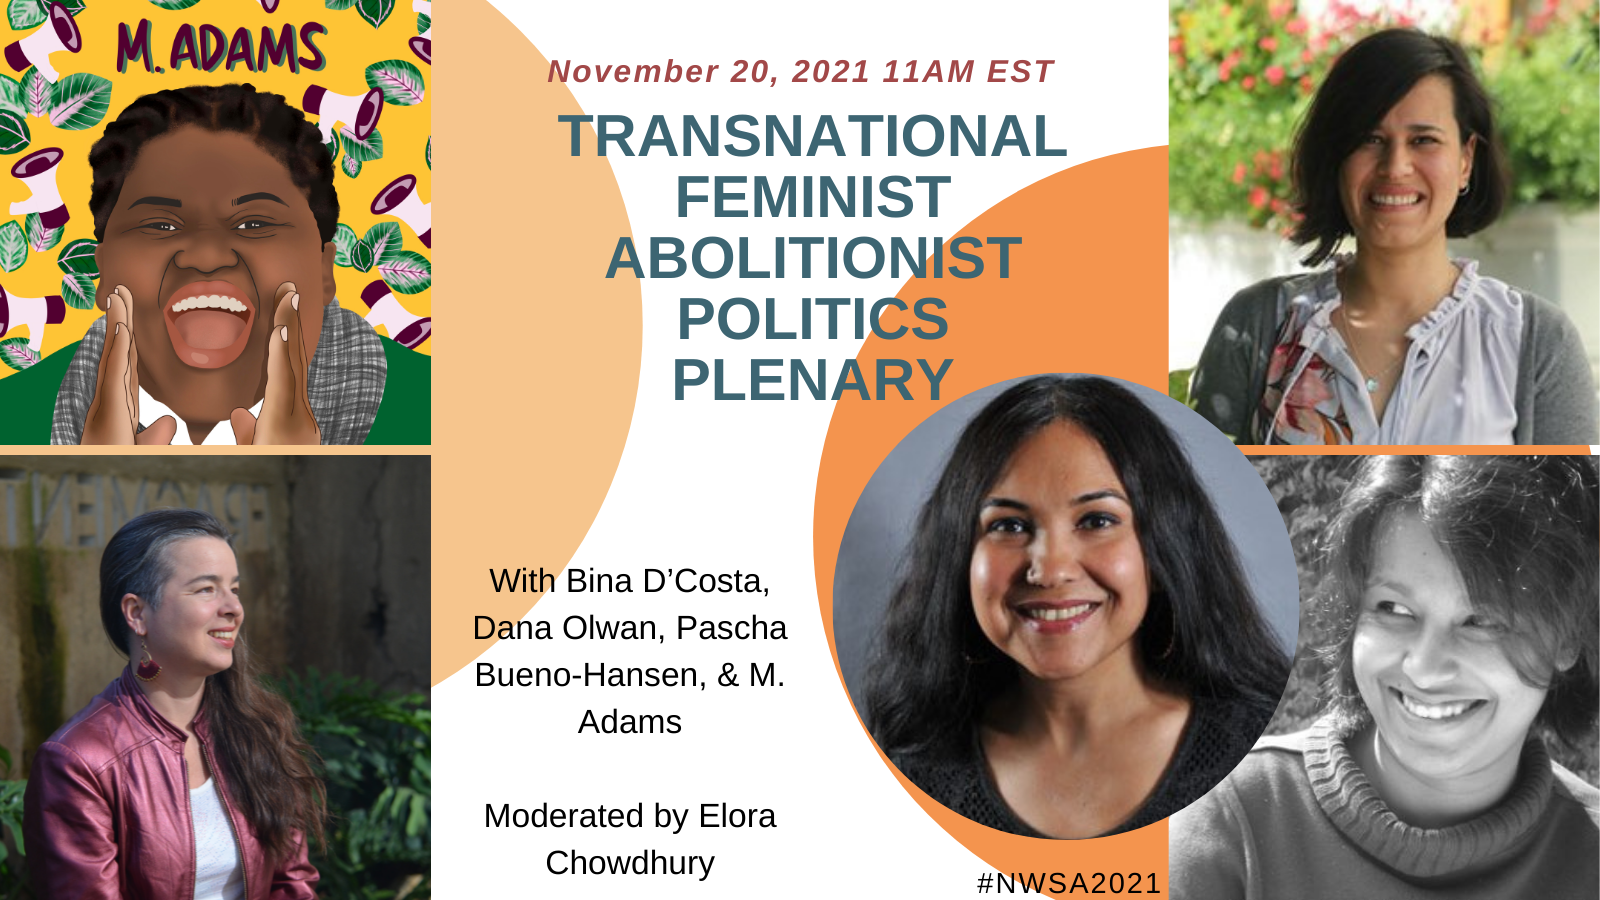 NWSA conference November 20 Transnational Feminist Abolitionist Politics